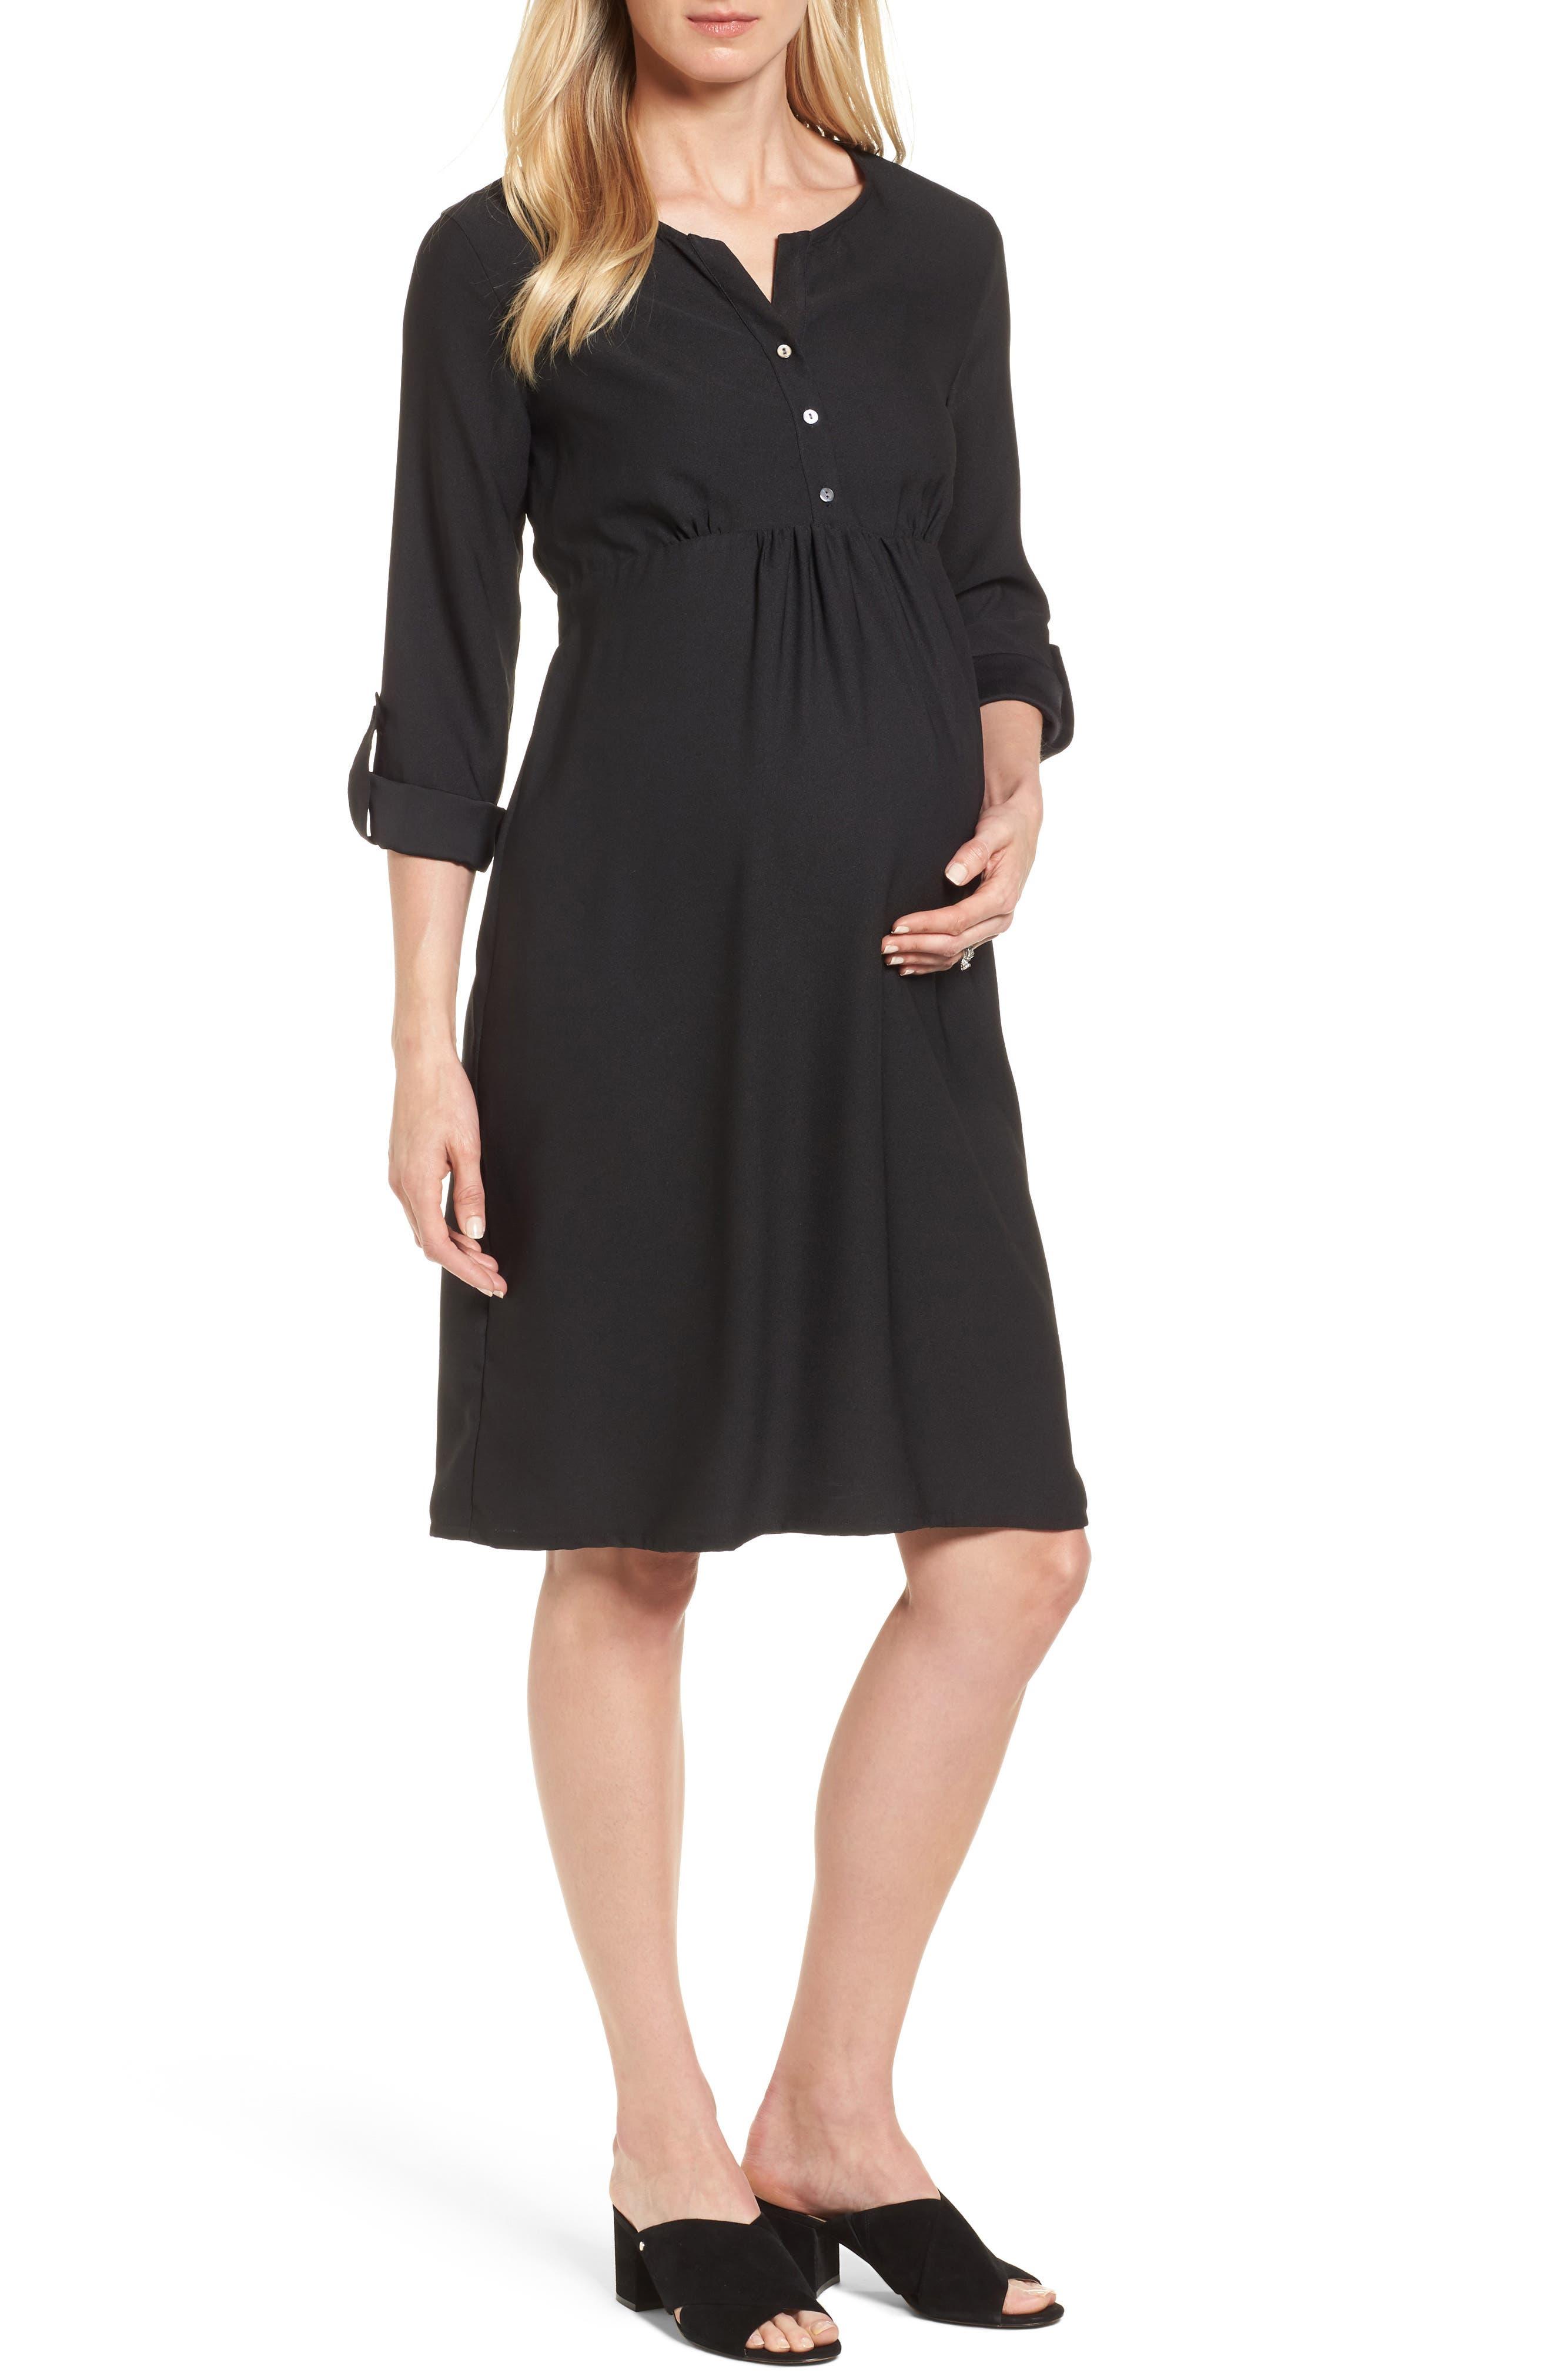 Catriona Maternity Shift Dress,                         Main,                         color, Caviar Black